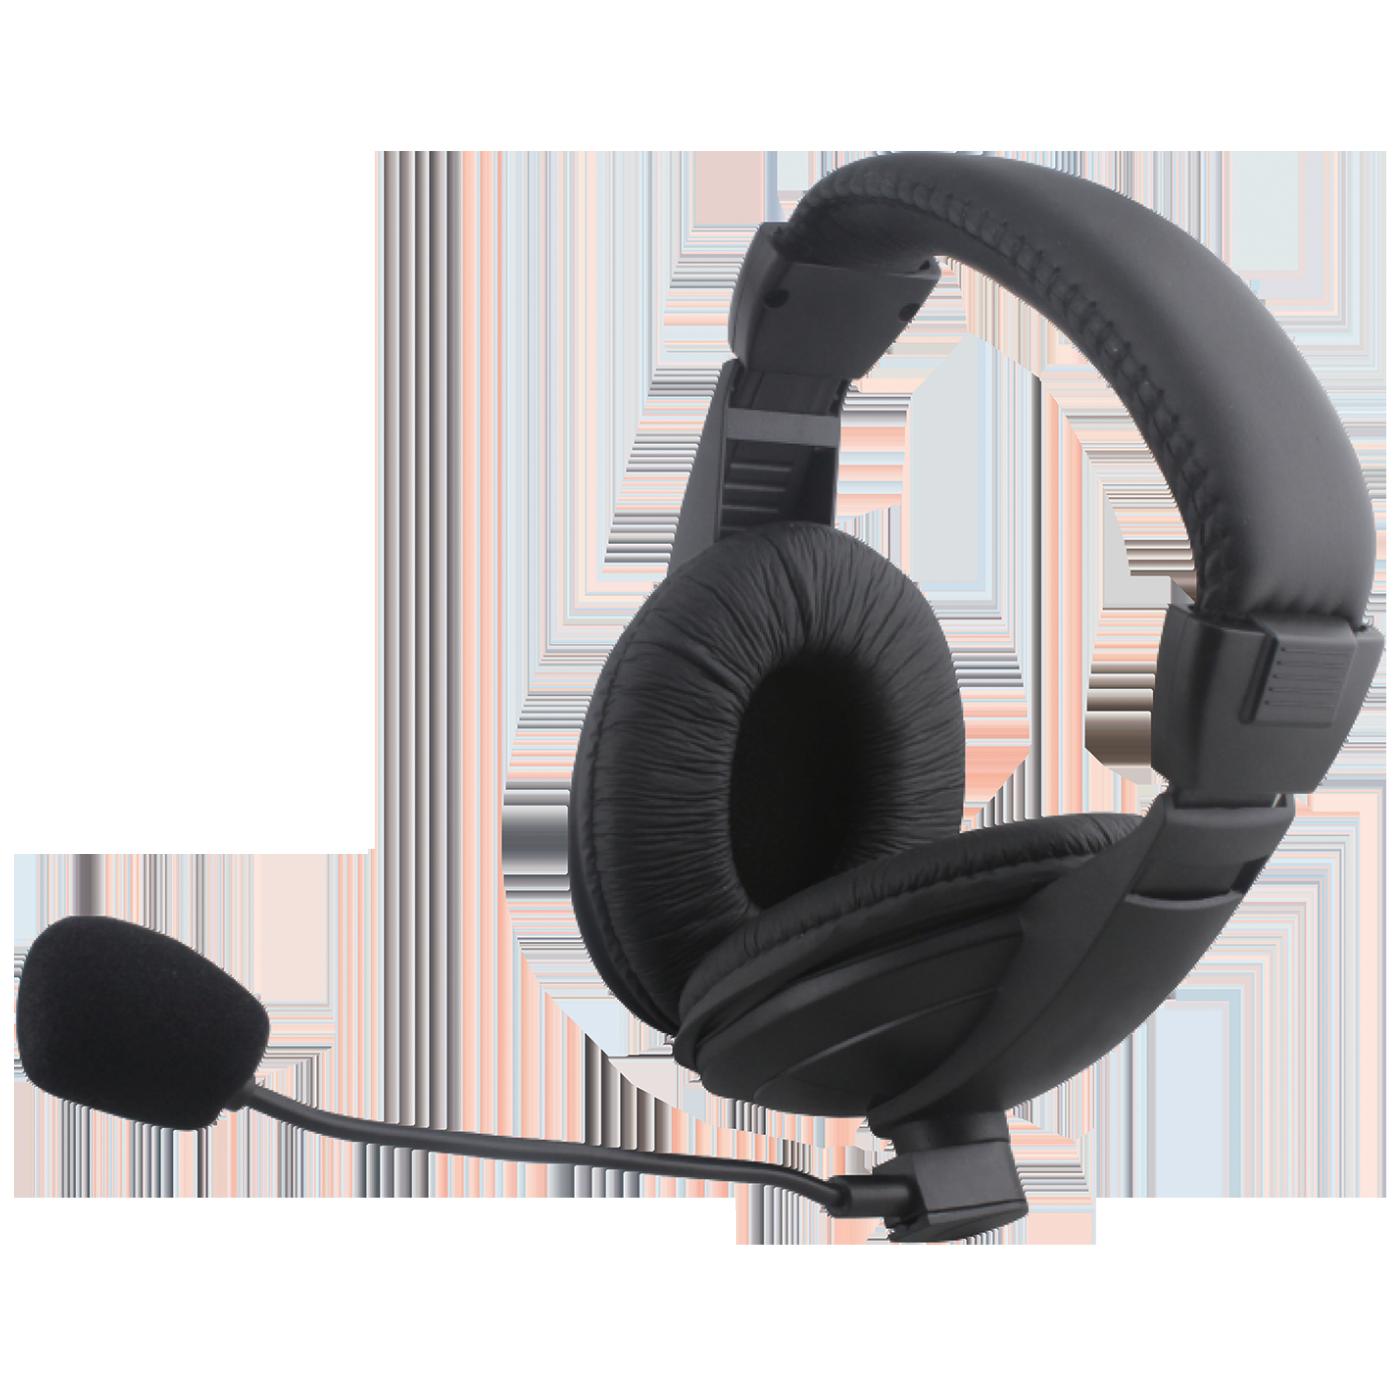 Slušalice+mikrofon, set, konekcija Jack 3.5mm,kožni jastučić